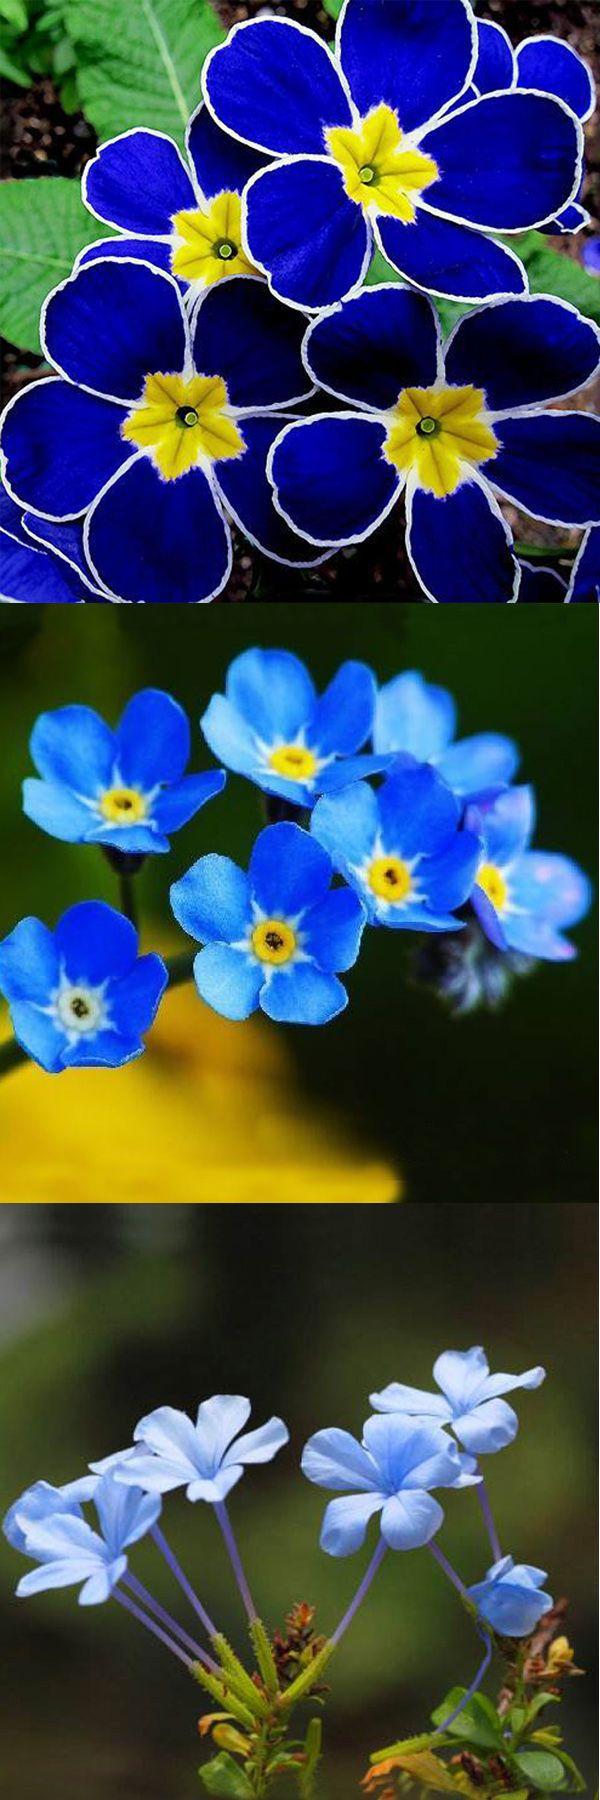 US$4.49 + free shipping.100Pcs Seeds, Blue Evening Primrose, Flower Bonsai, Garden Flower, Blue Flower, Gardening Decor, Flower Seeds